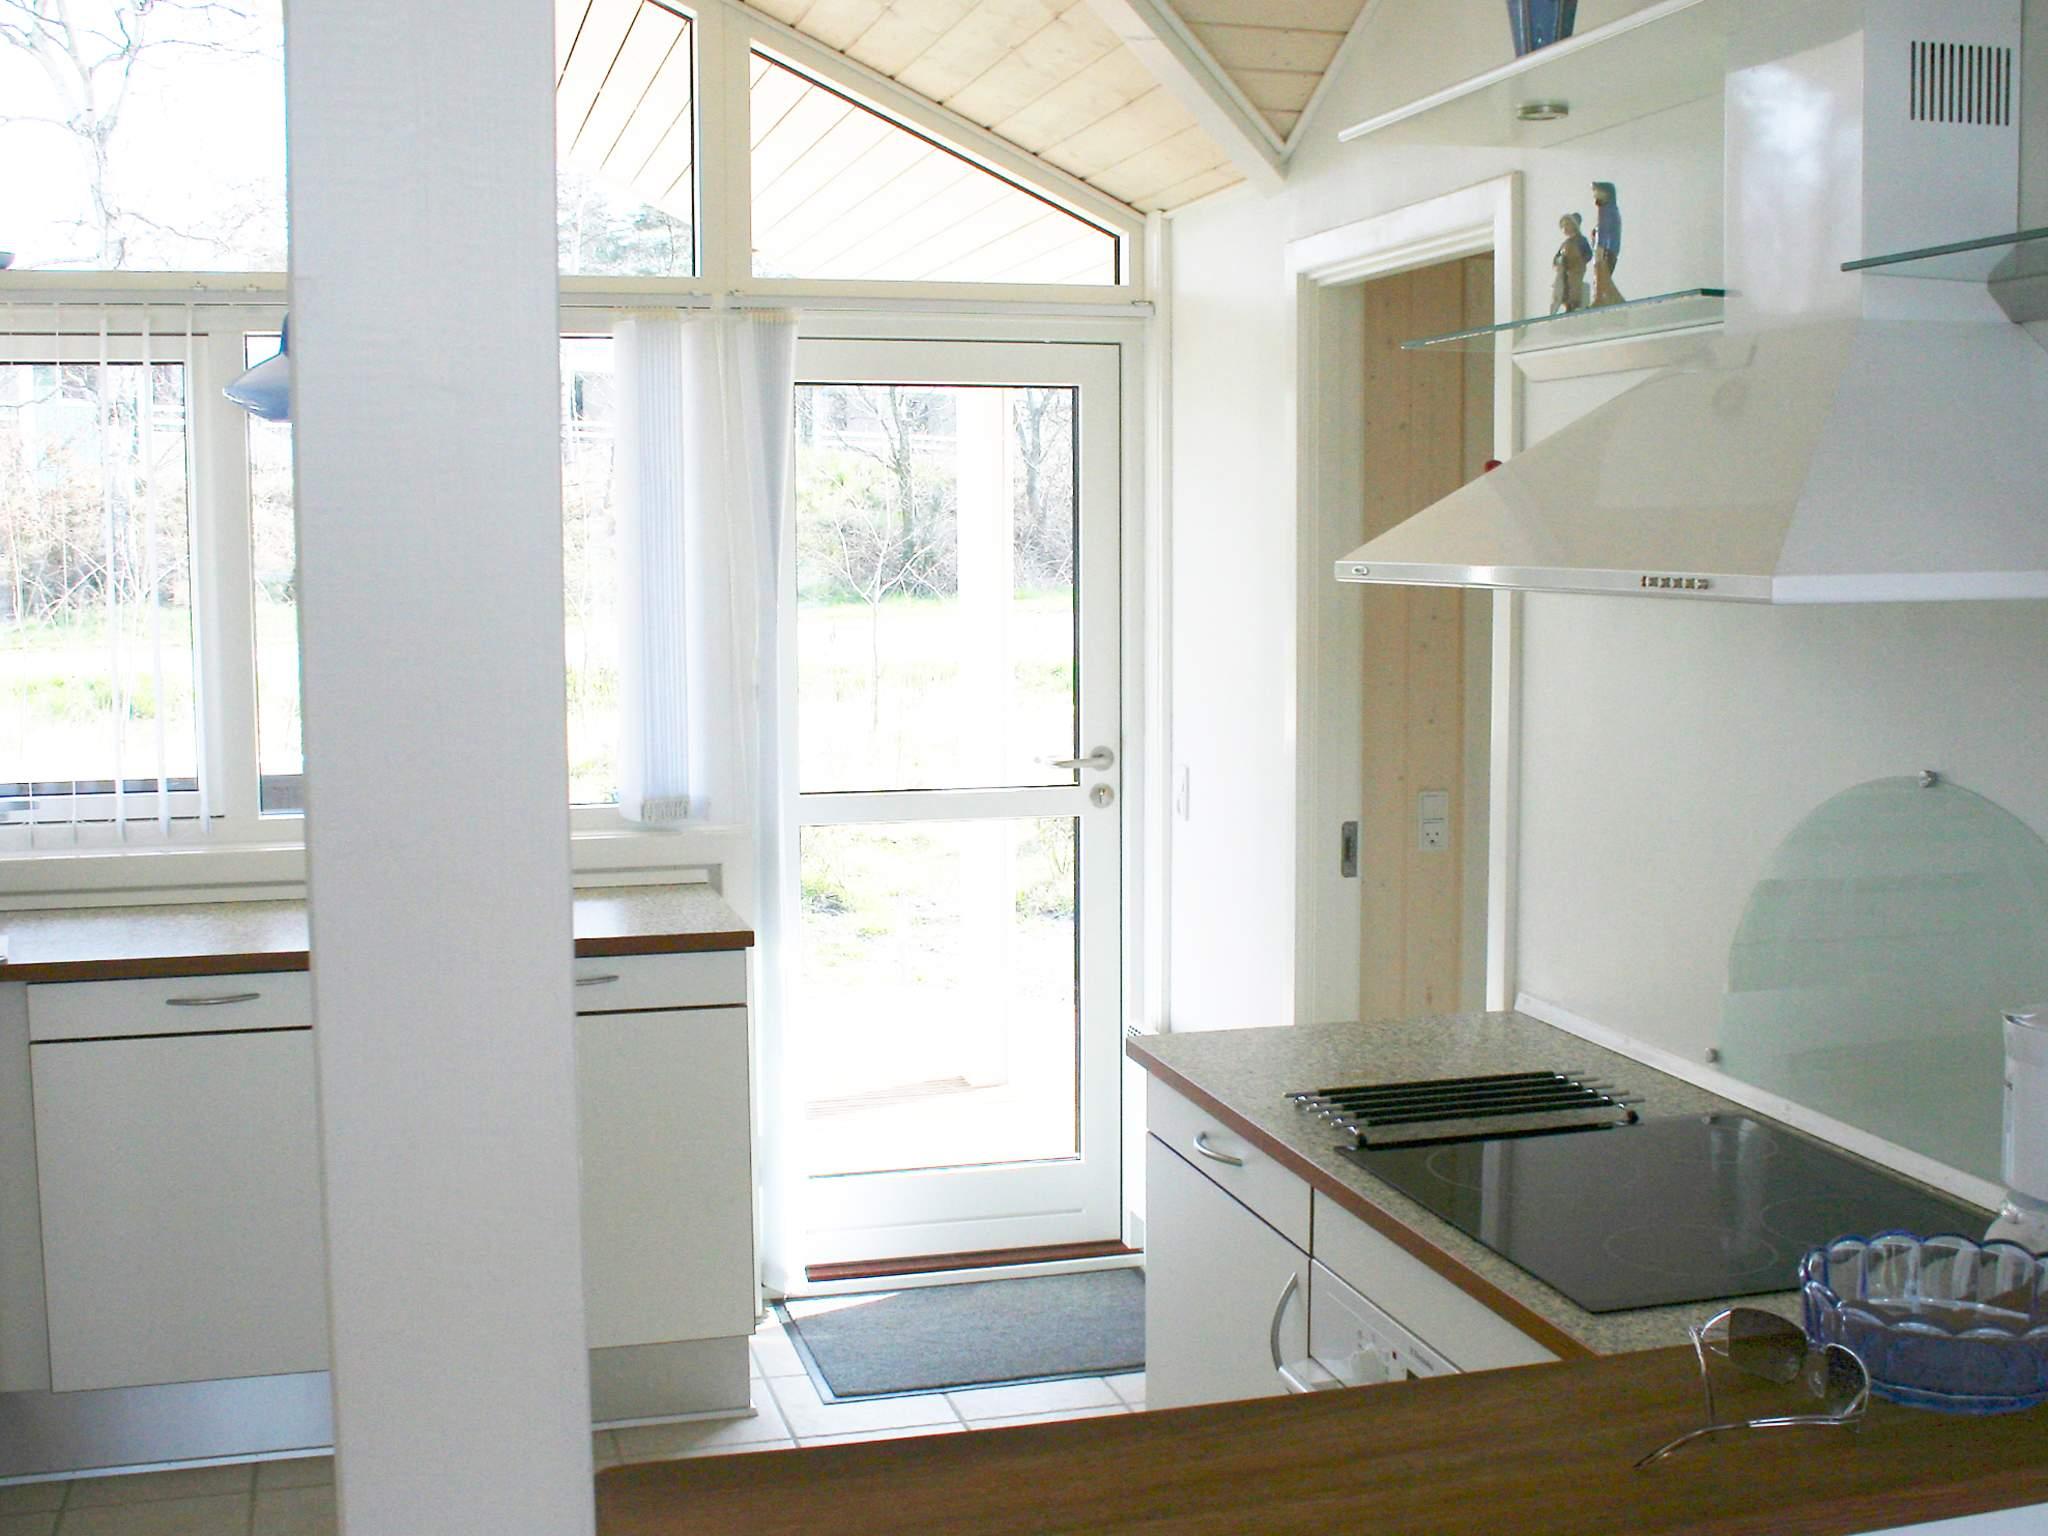 Ferienhaus Balka Strand (334426), Balke, , Bornholm, Dänemark, Bild 10